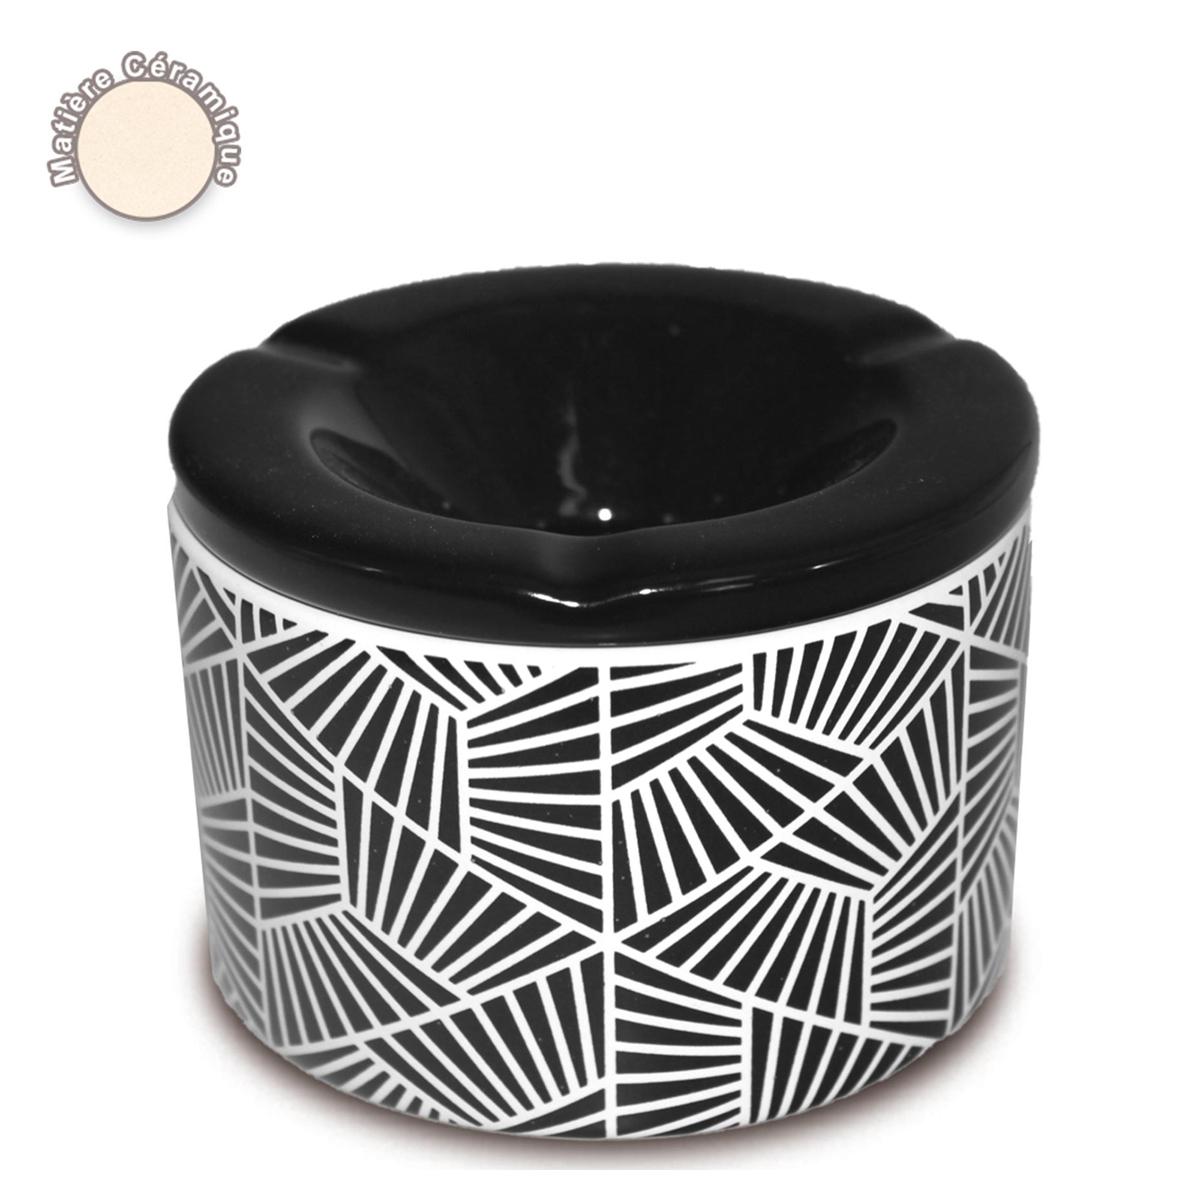 Cendrier marocain céramique \'Boho\' noir - 10x7 cm - [A0559]